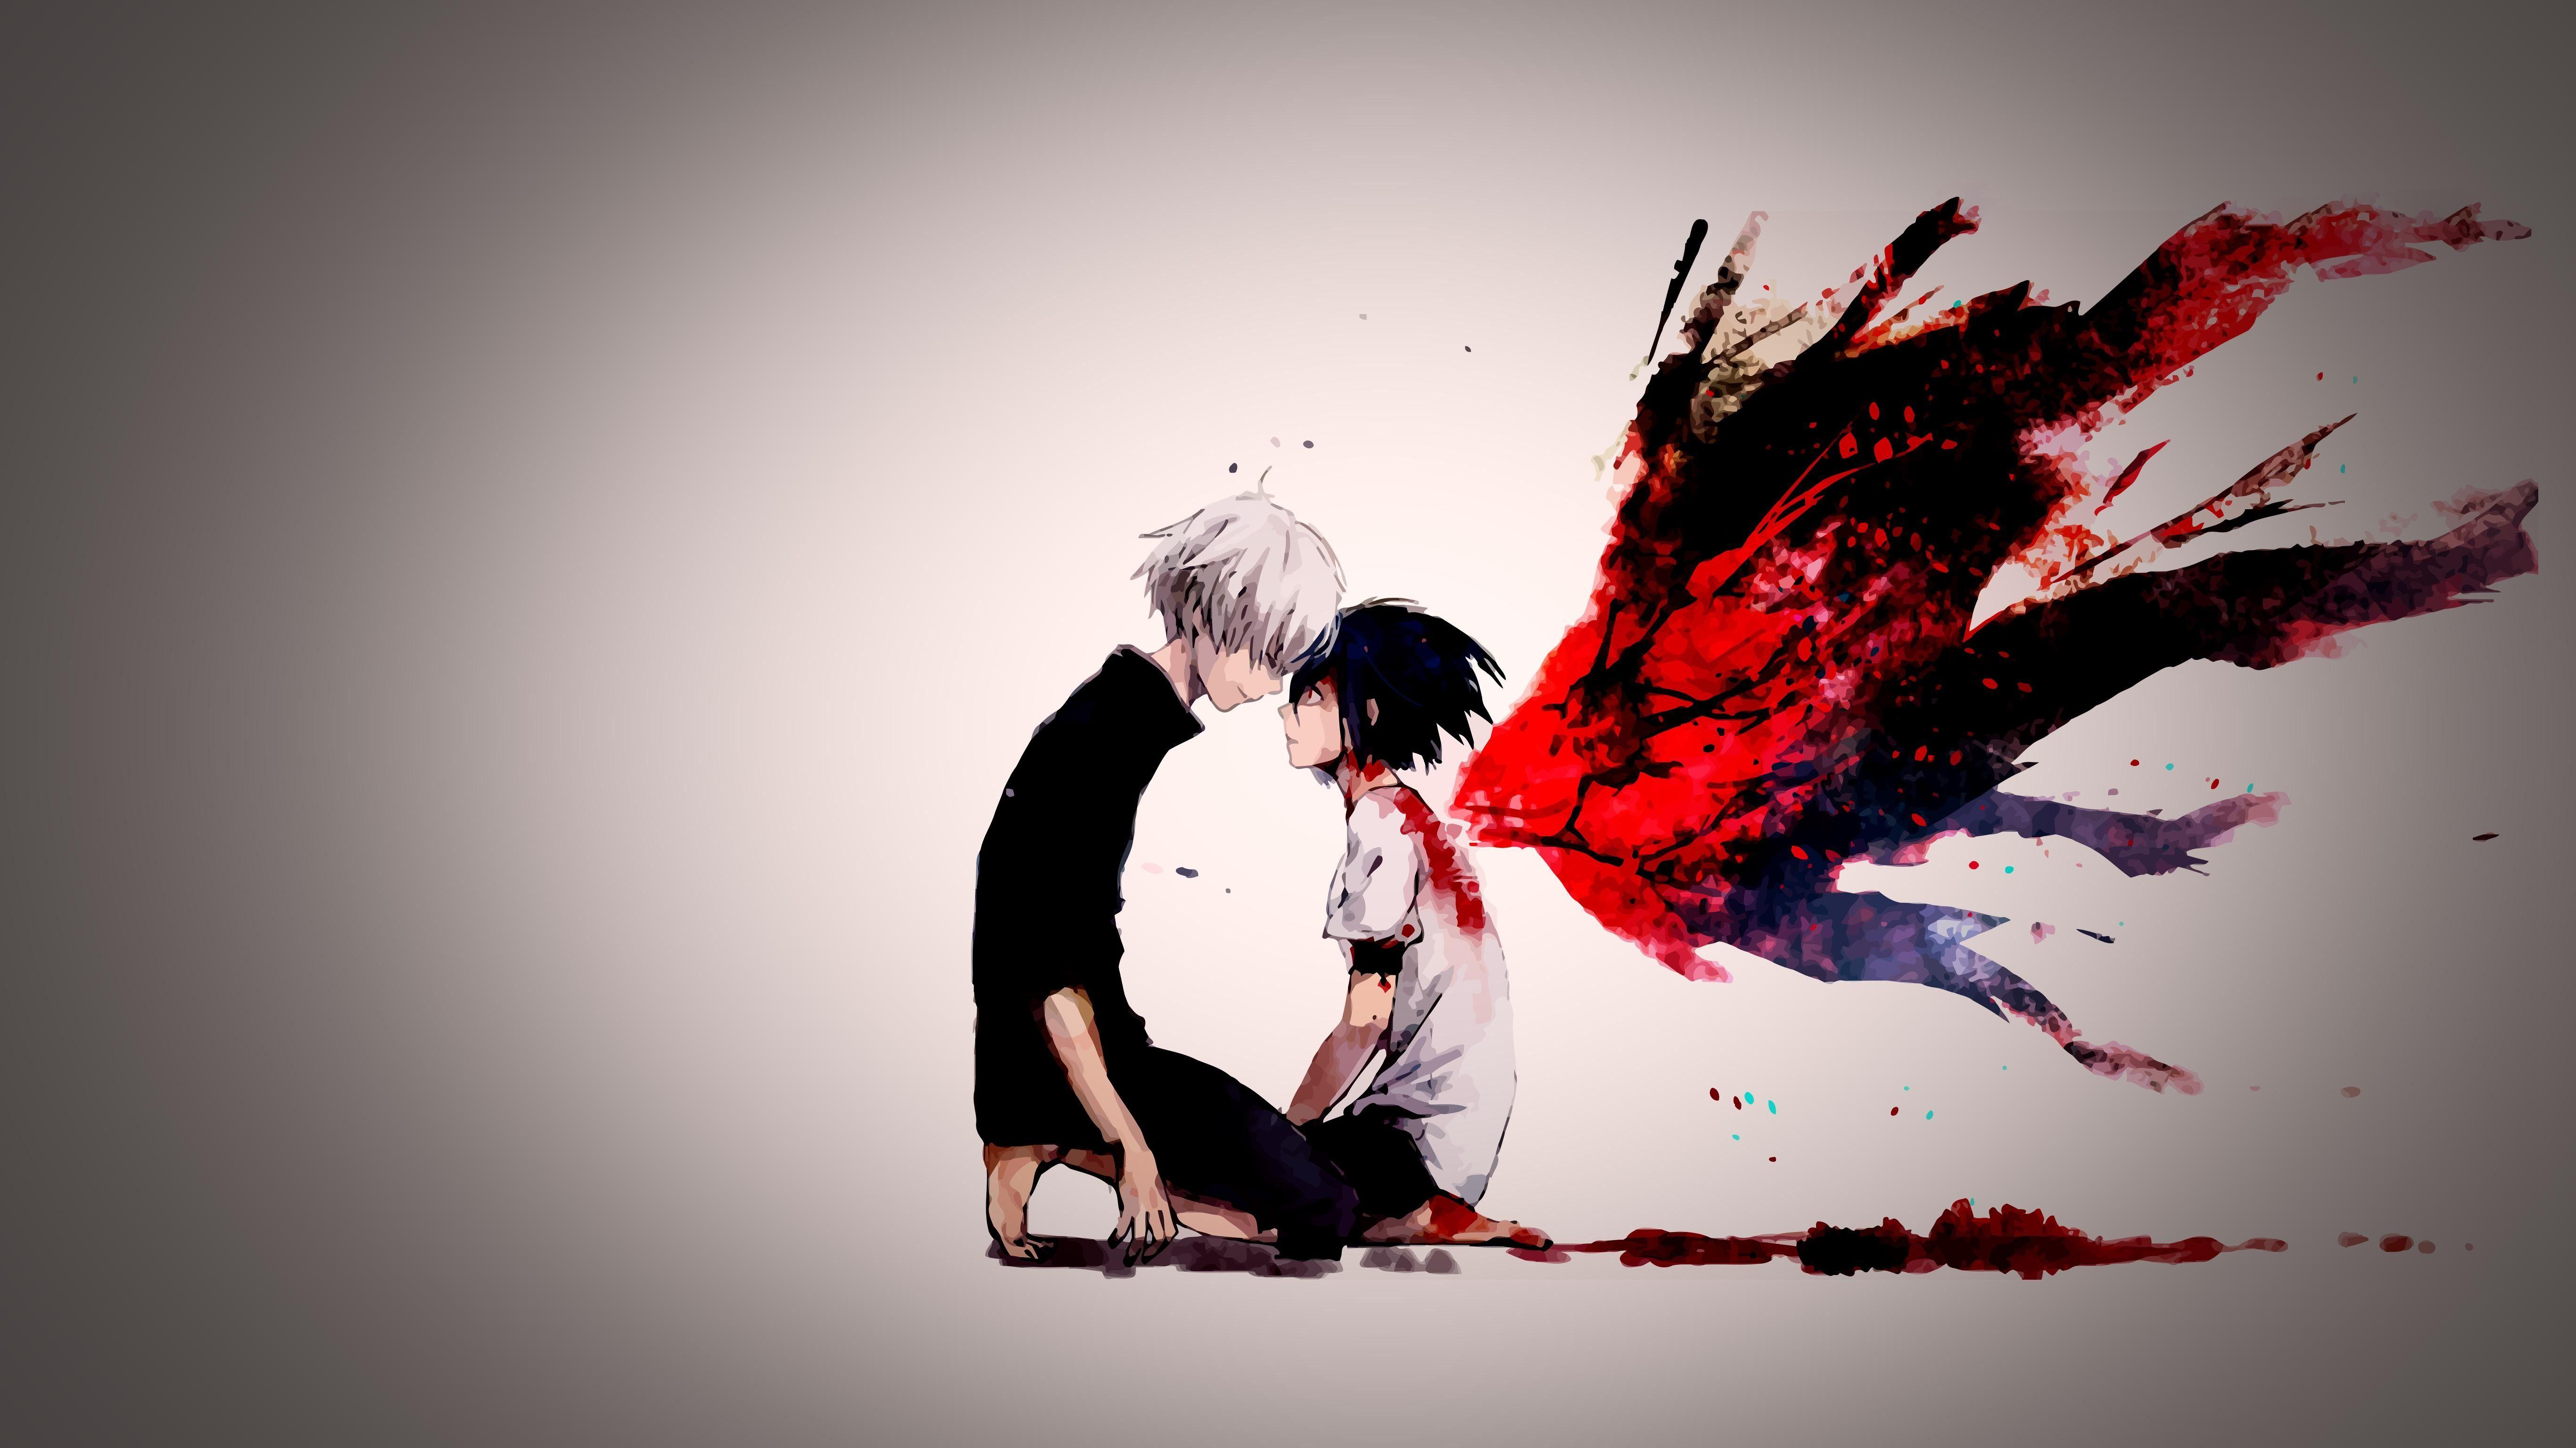 Épinglé sur Anime/Artwork/FantasyArt...